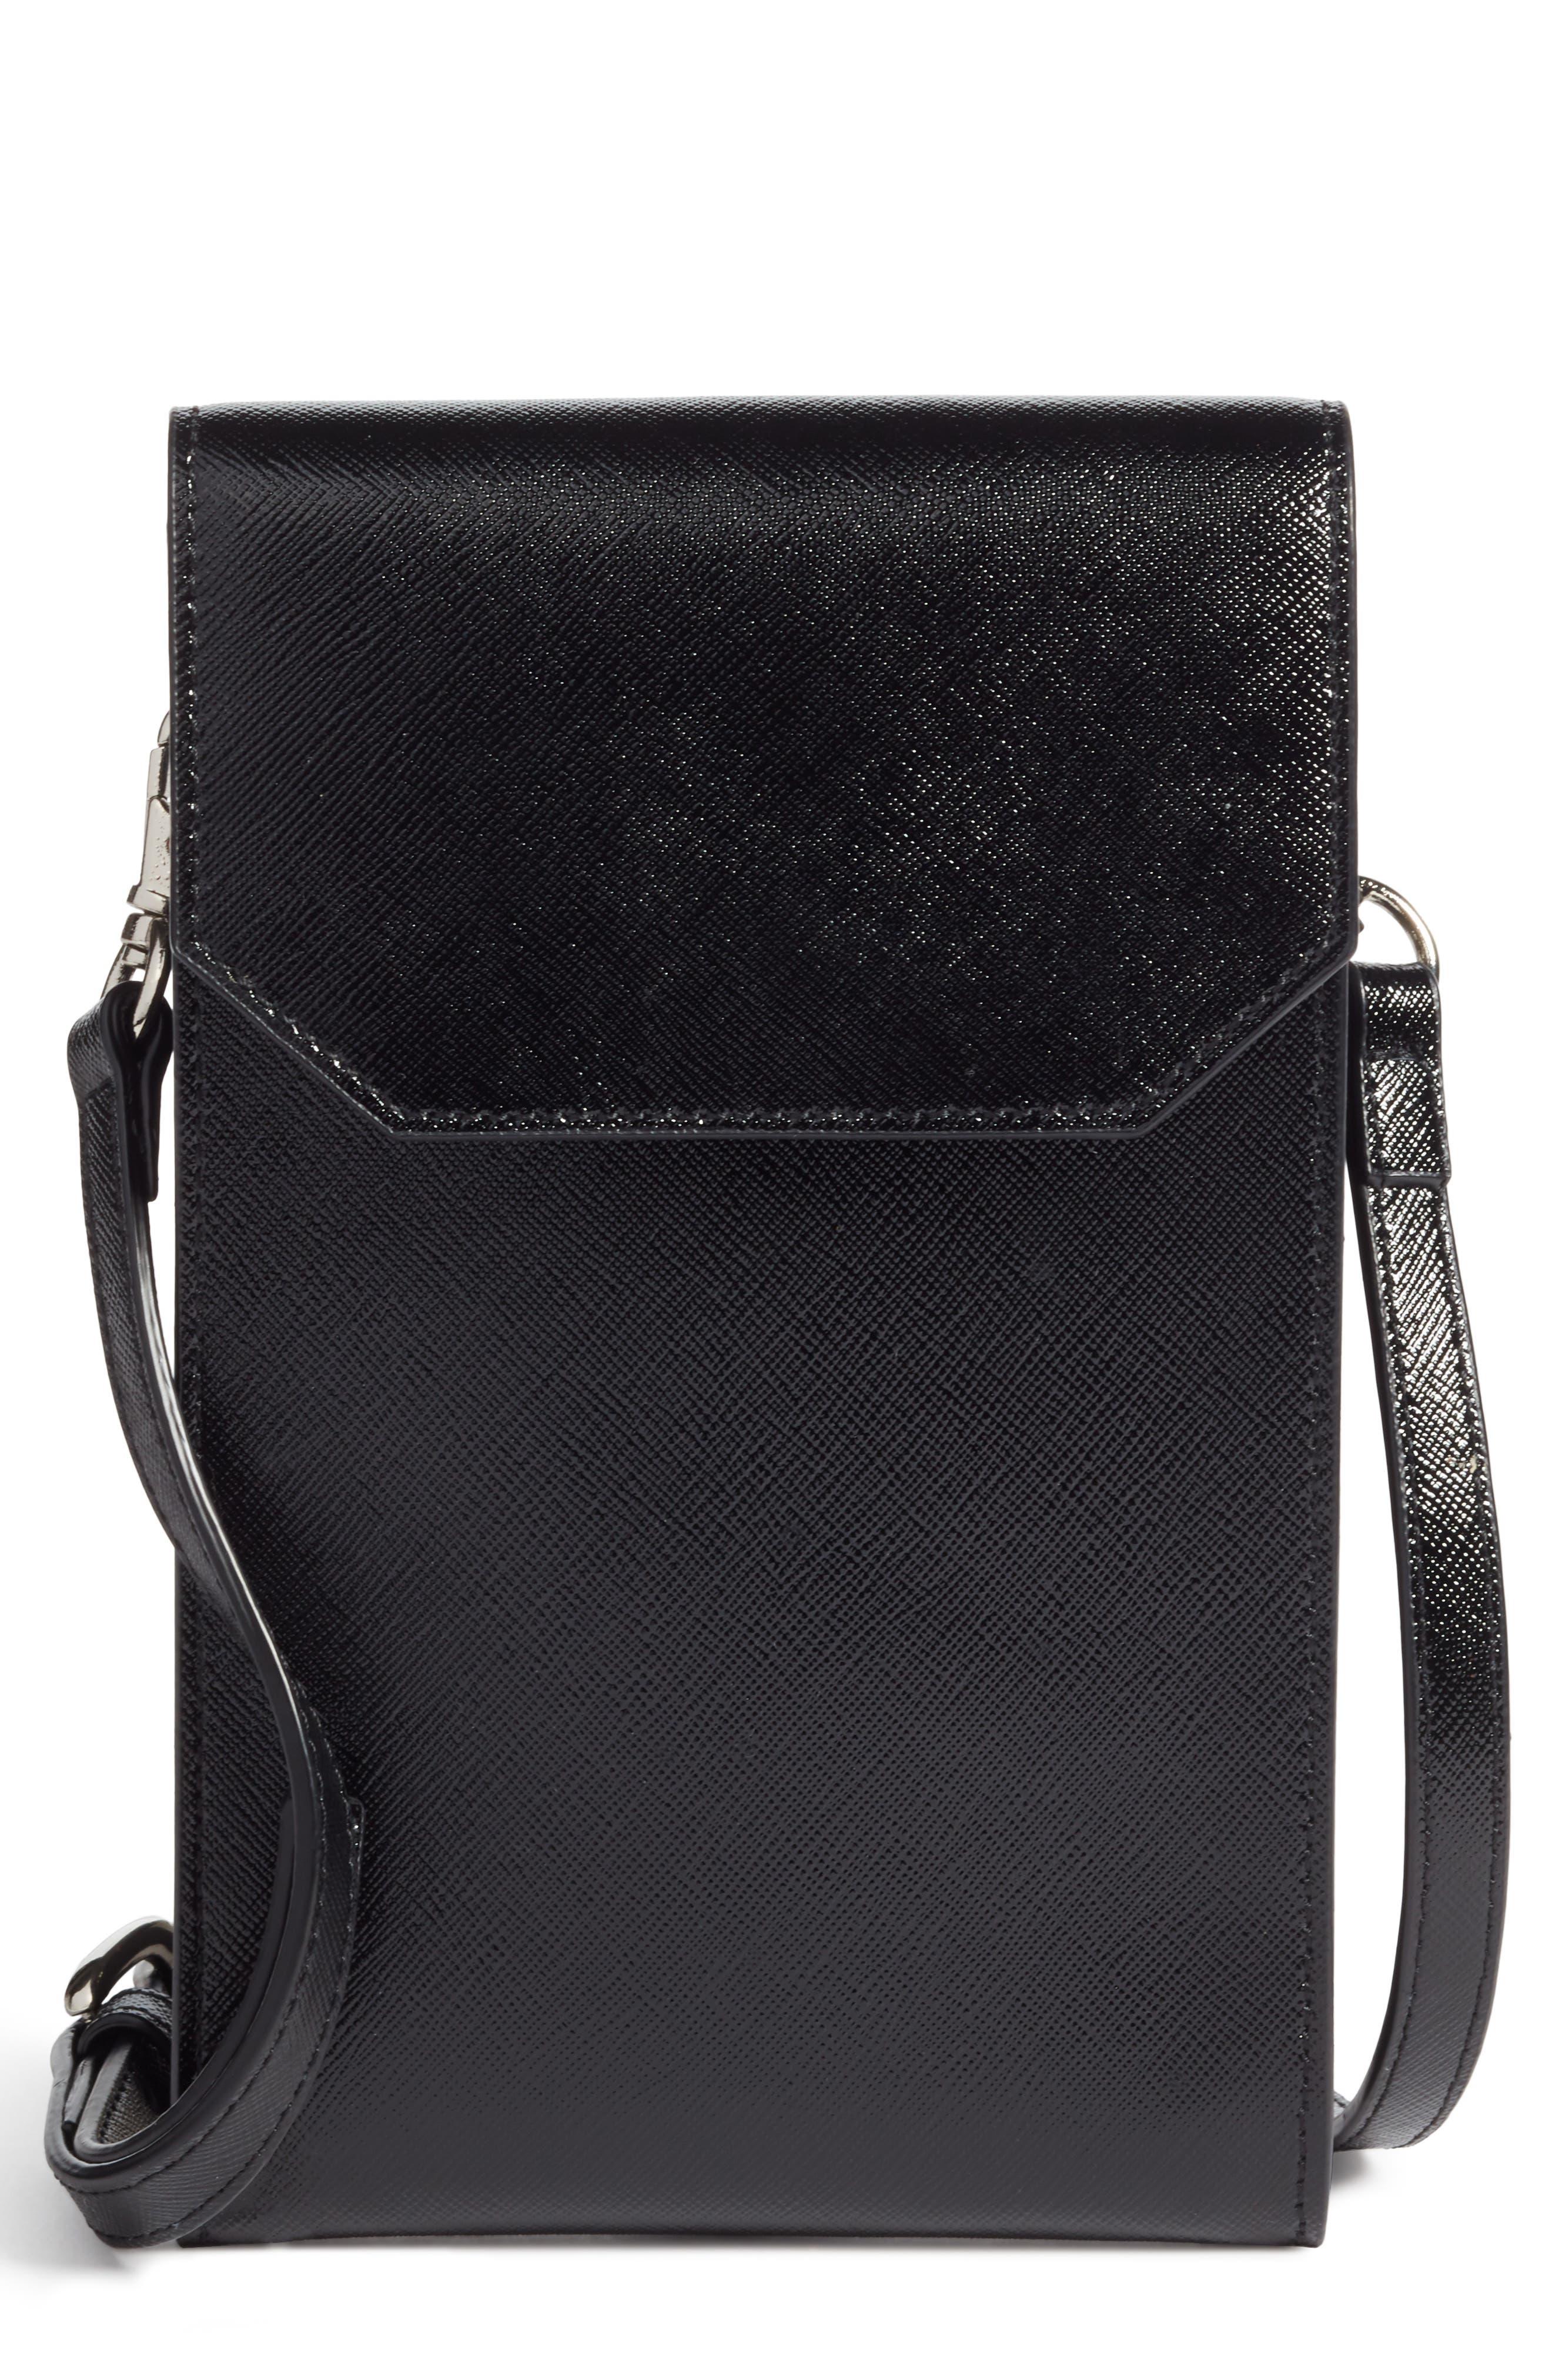 Leather Phone Crossbody Bag,                             Main thumbnail 1, color,                             BLACK